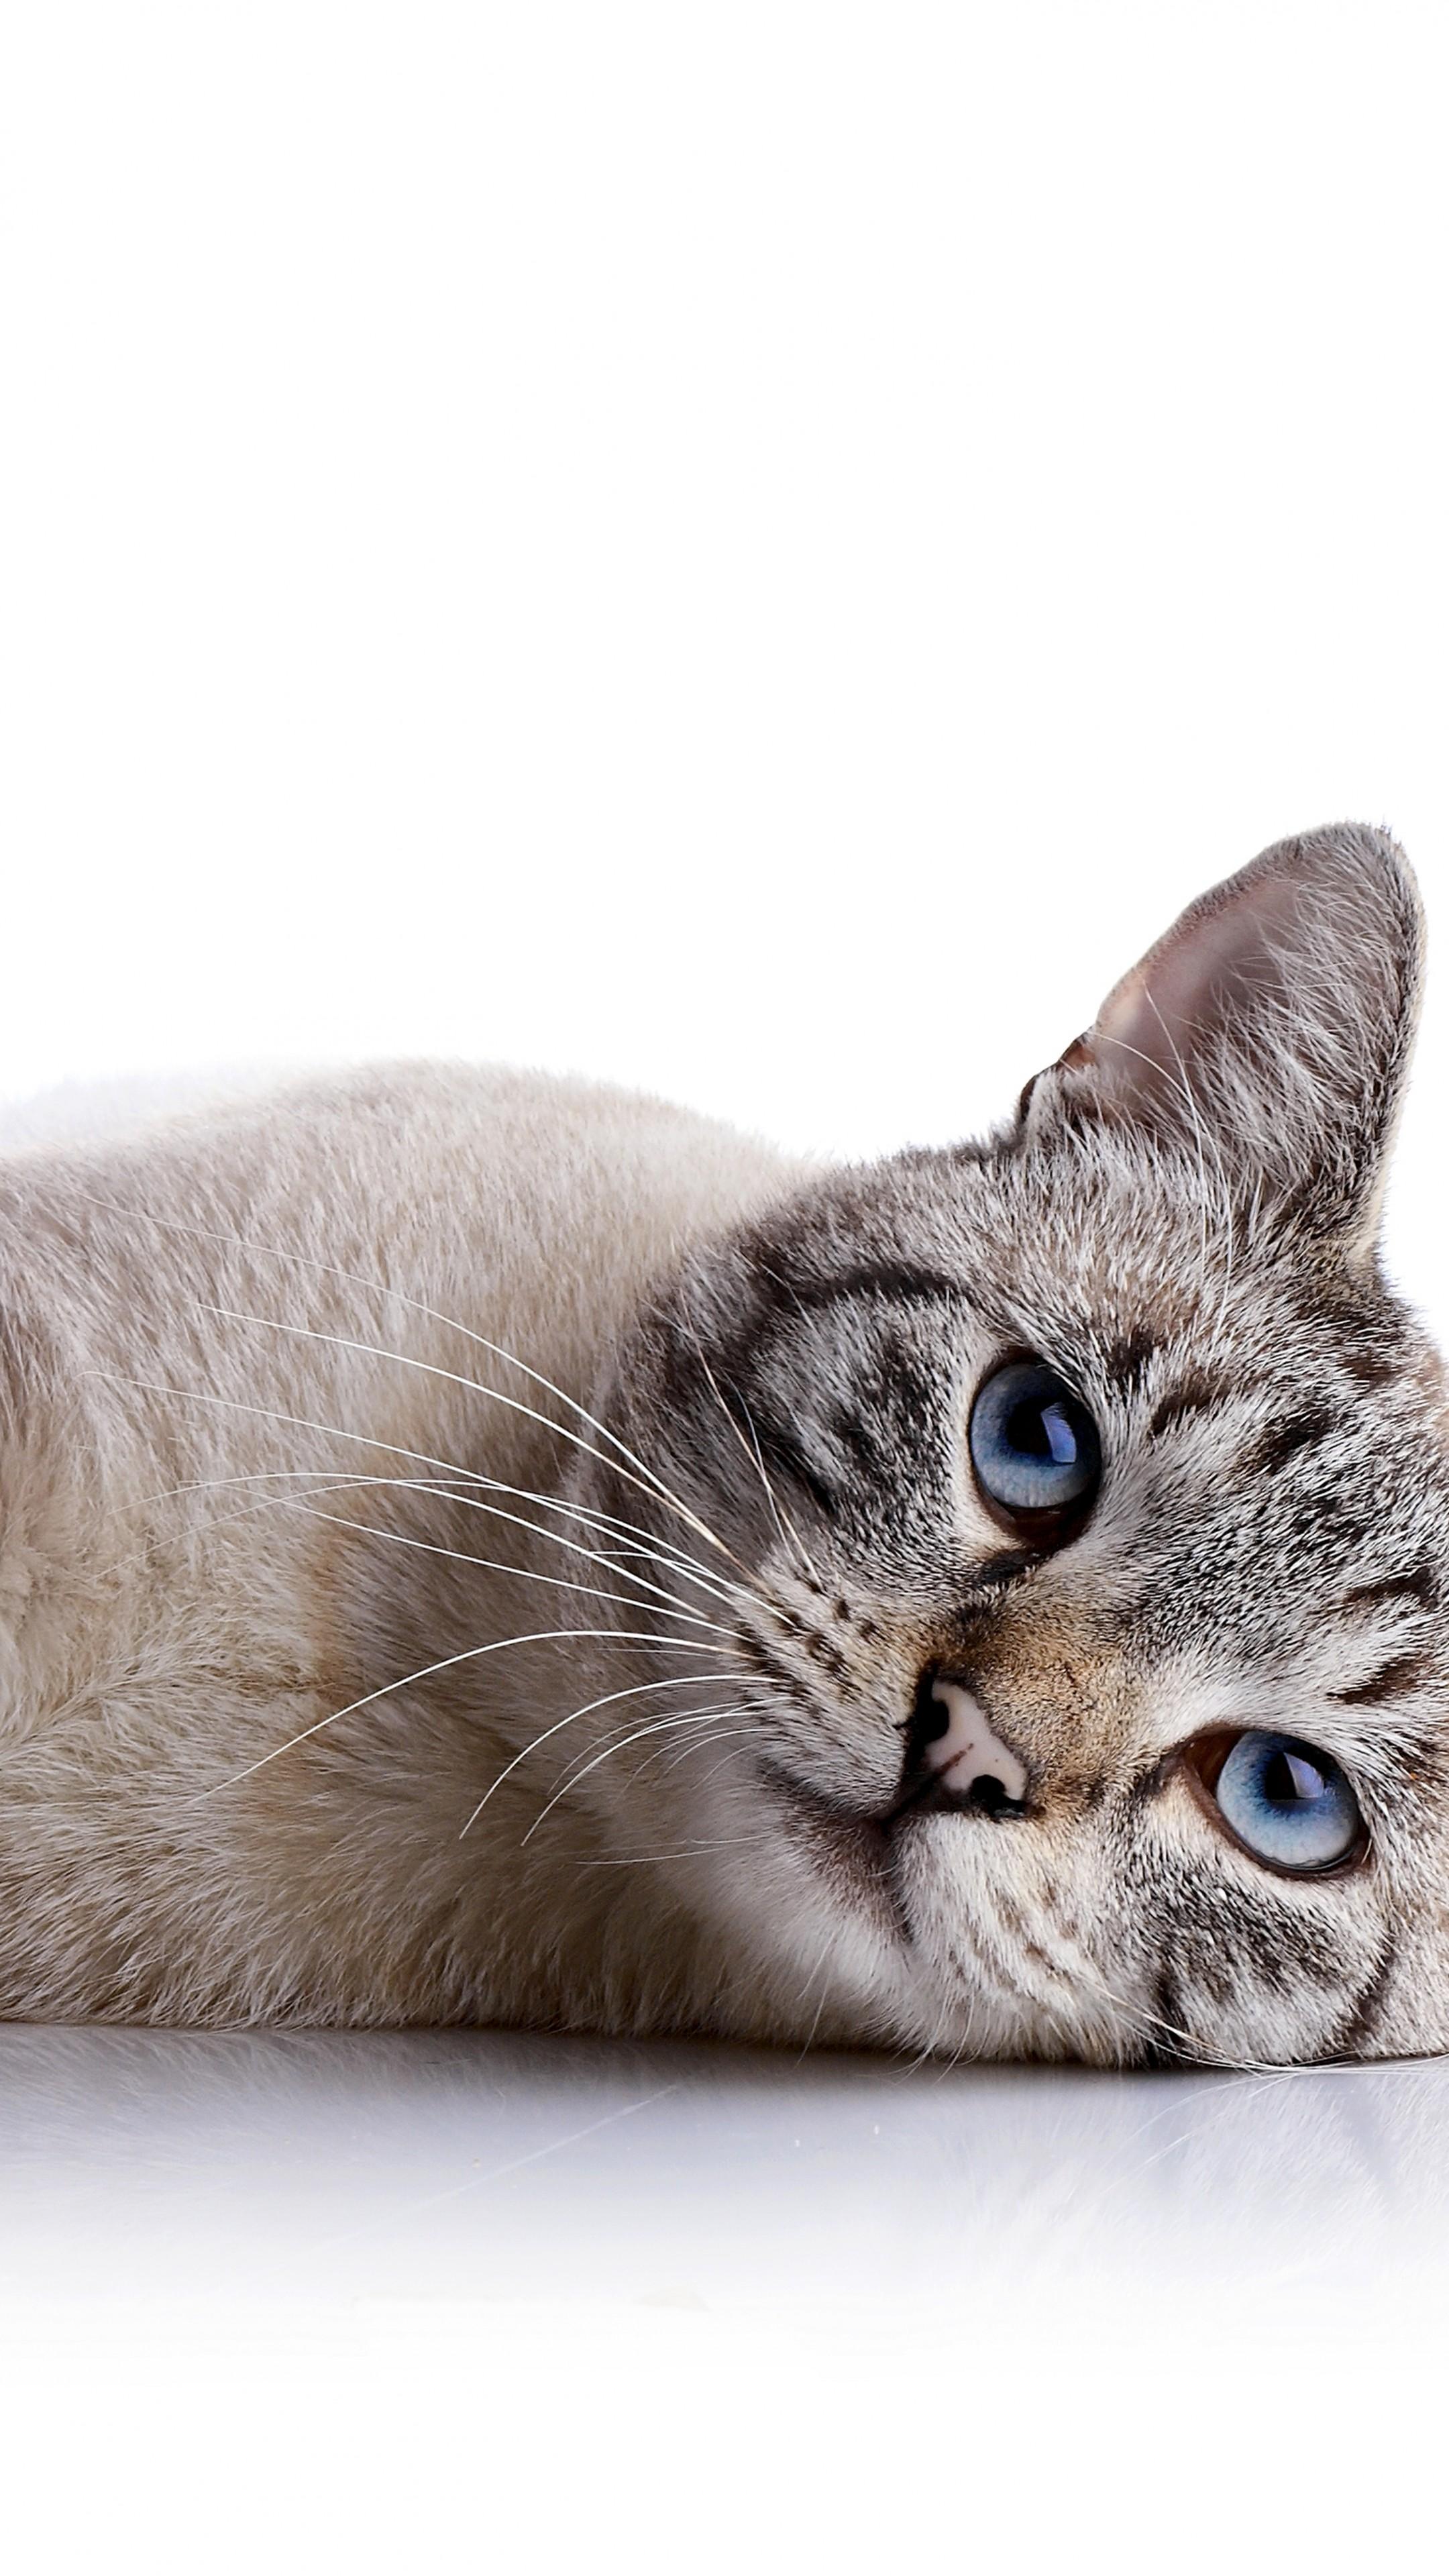 Cute Quotes Wallpapers Pinterest Wallpaper Cat Cute Animals 8k Animals 15371